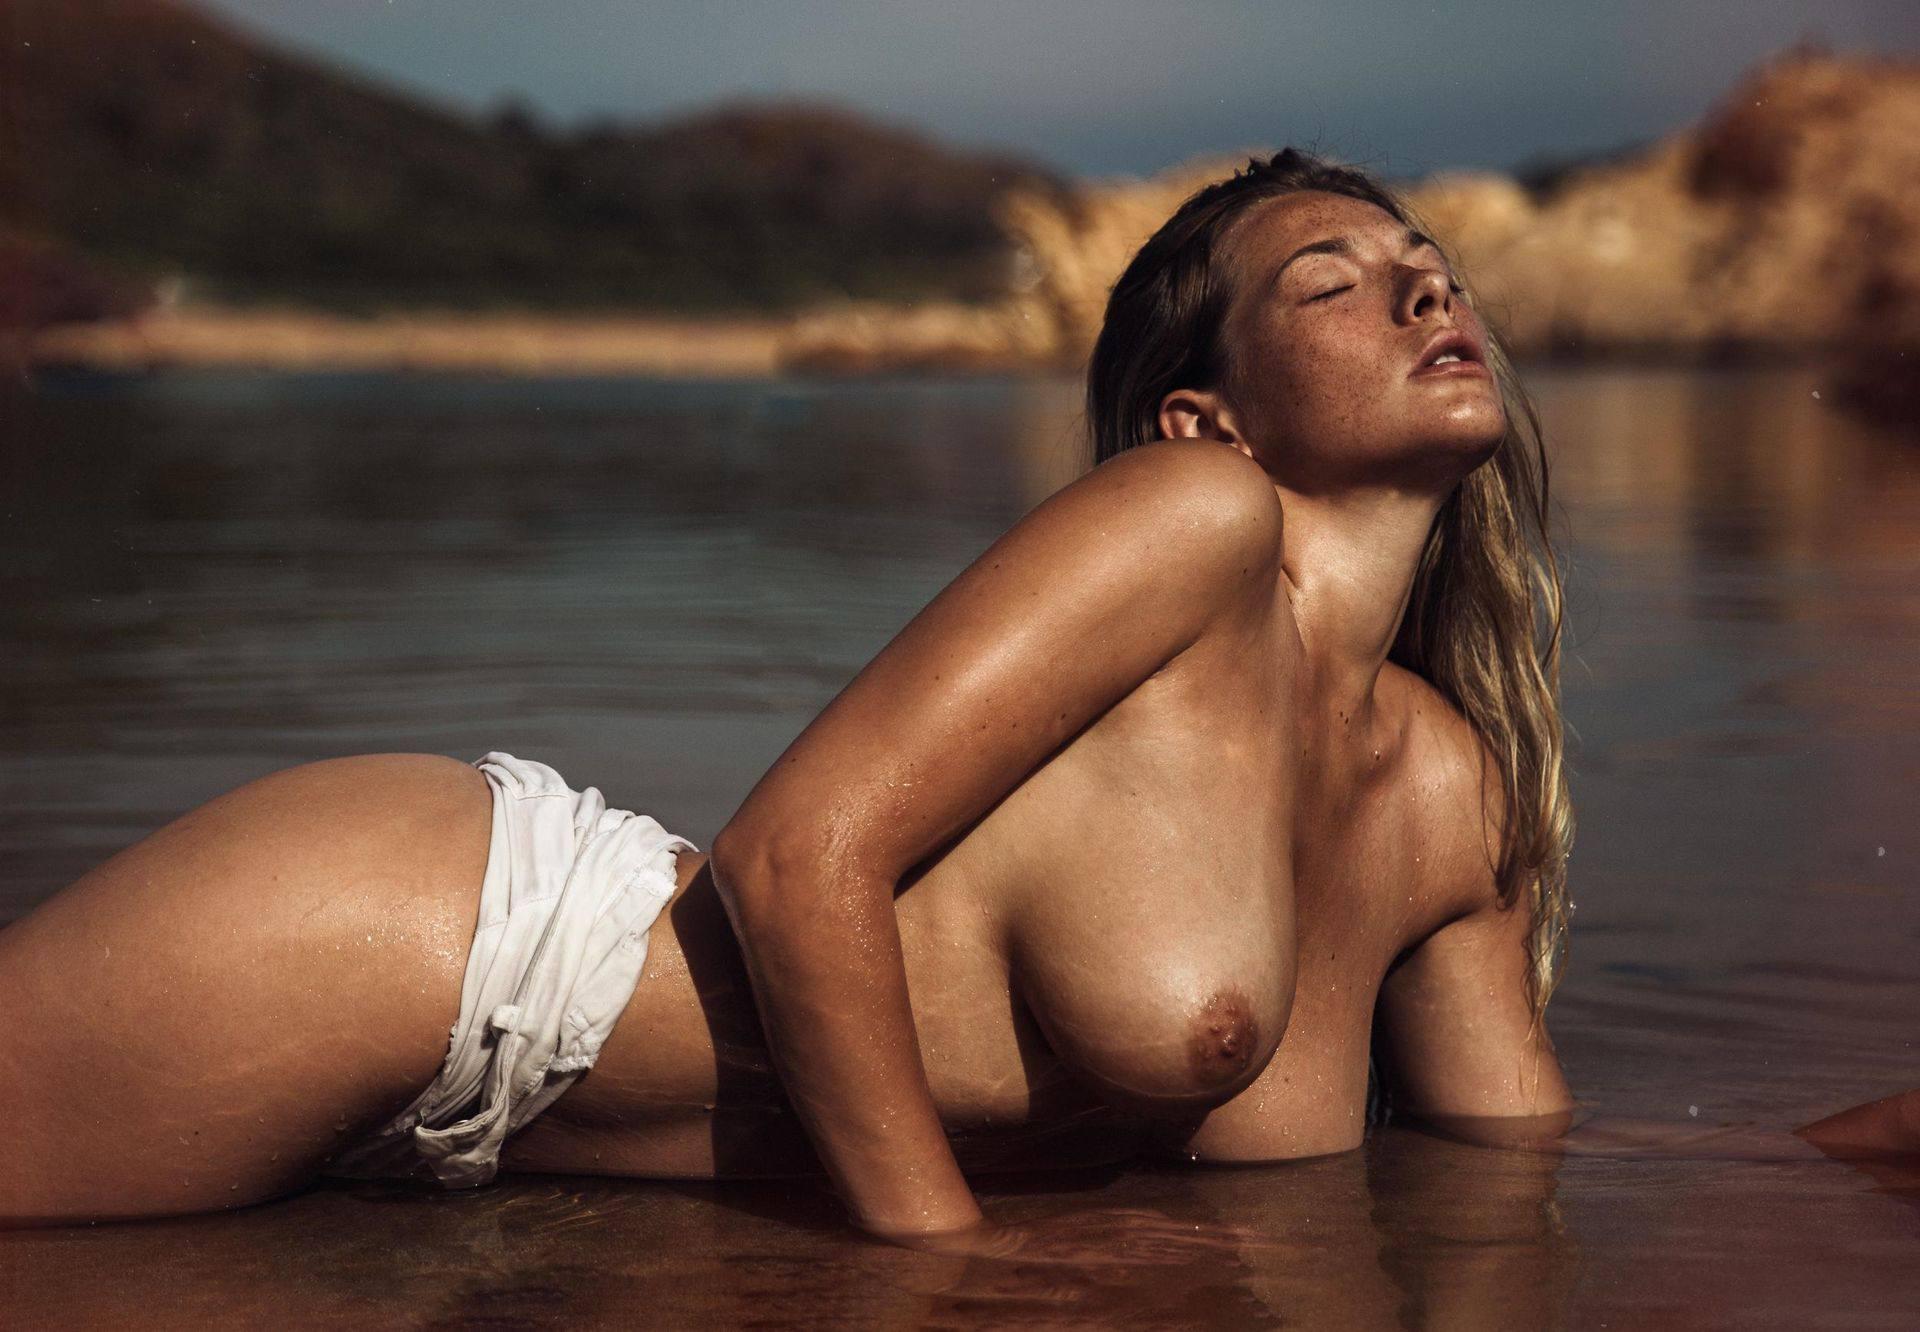 Olga Kobzar – Hot Big Boobs In Sexy Full Frontal Nude Photoshoot By Thomas Agatz (nsfw) 0008